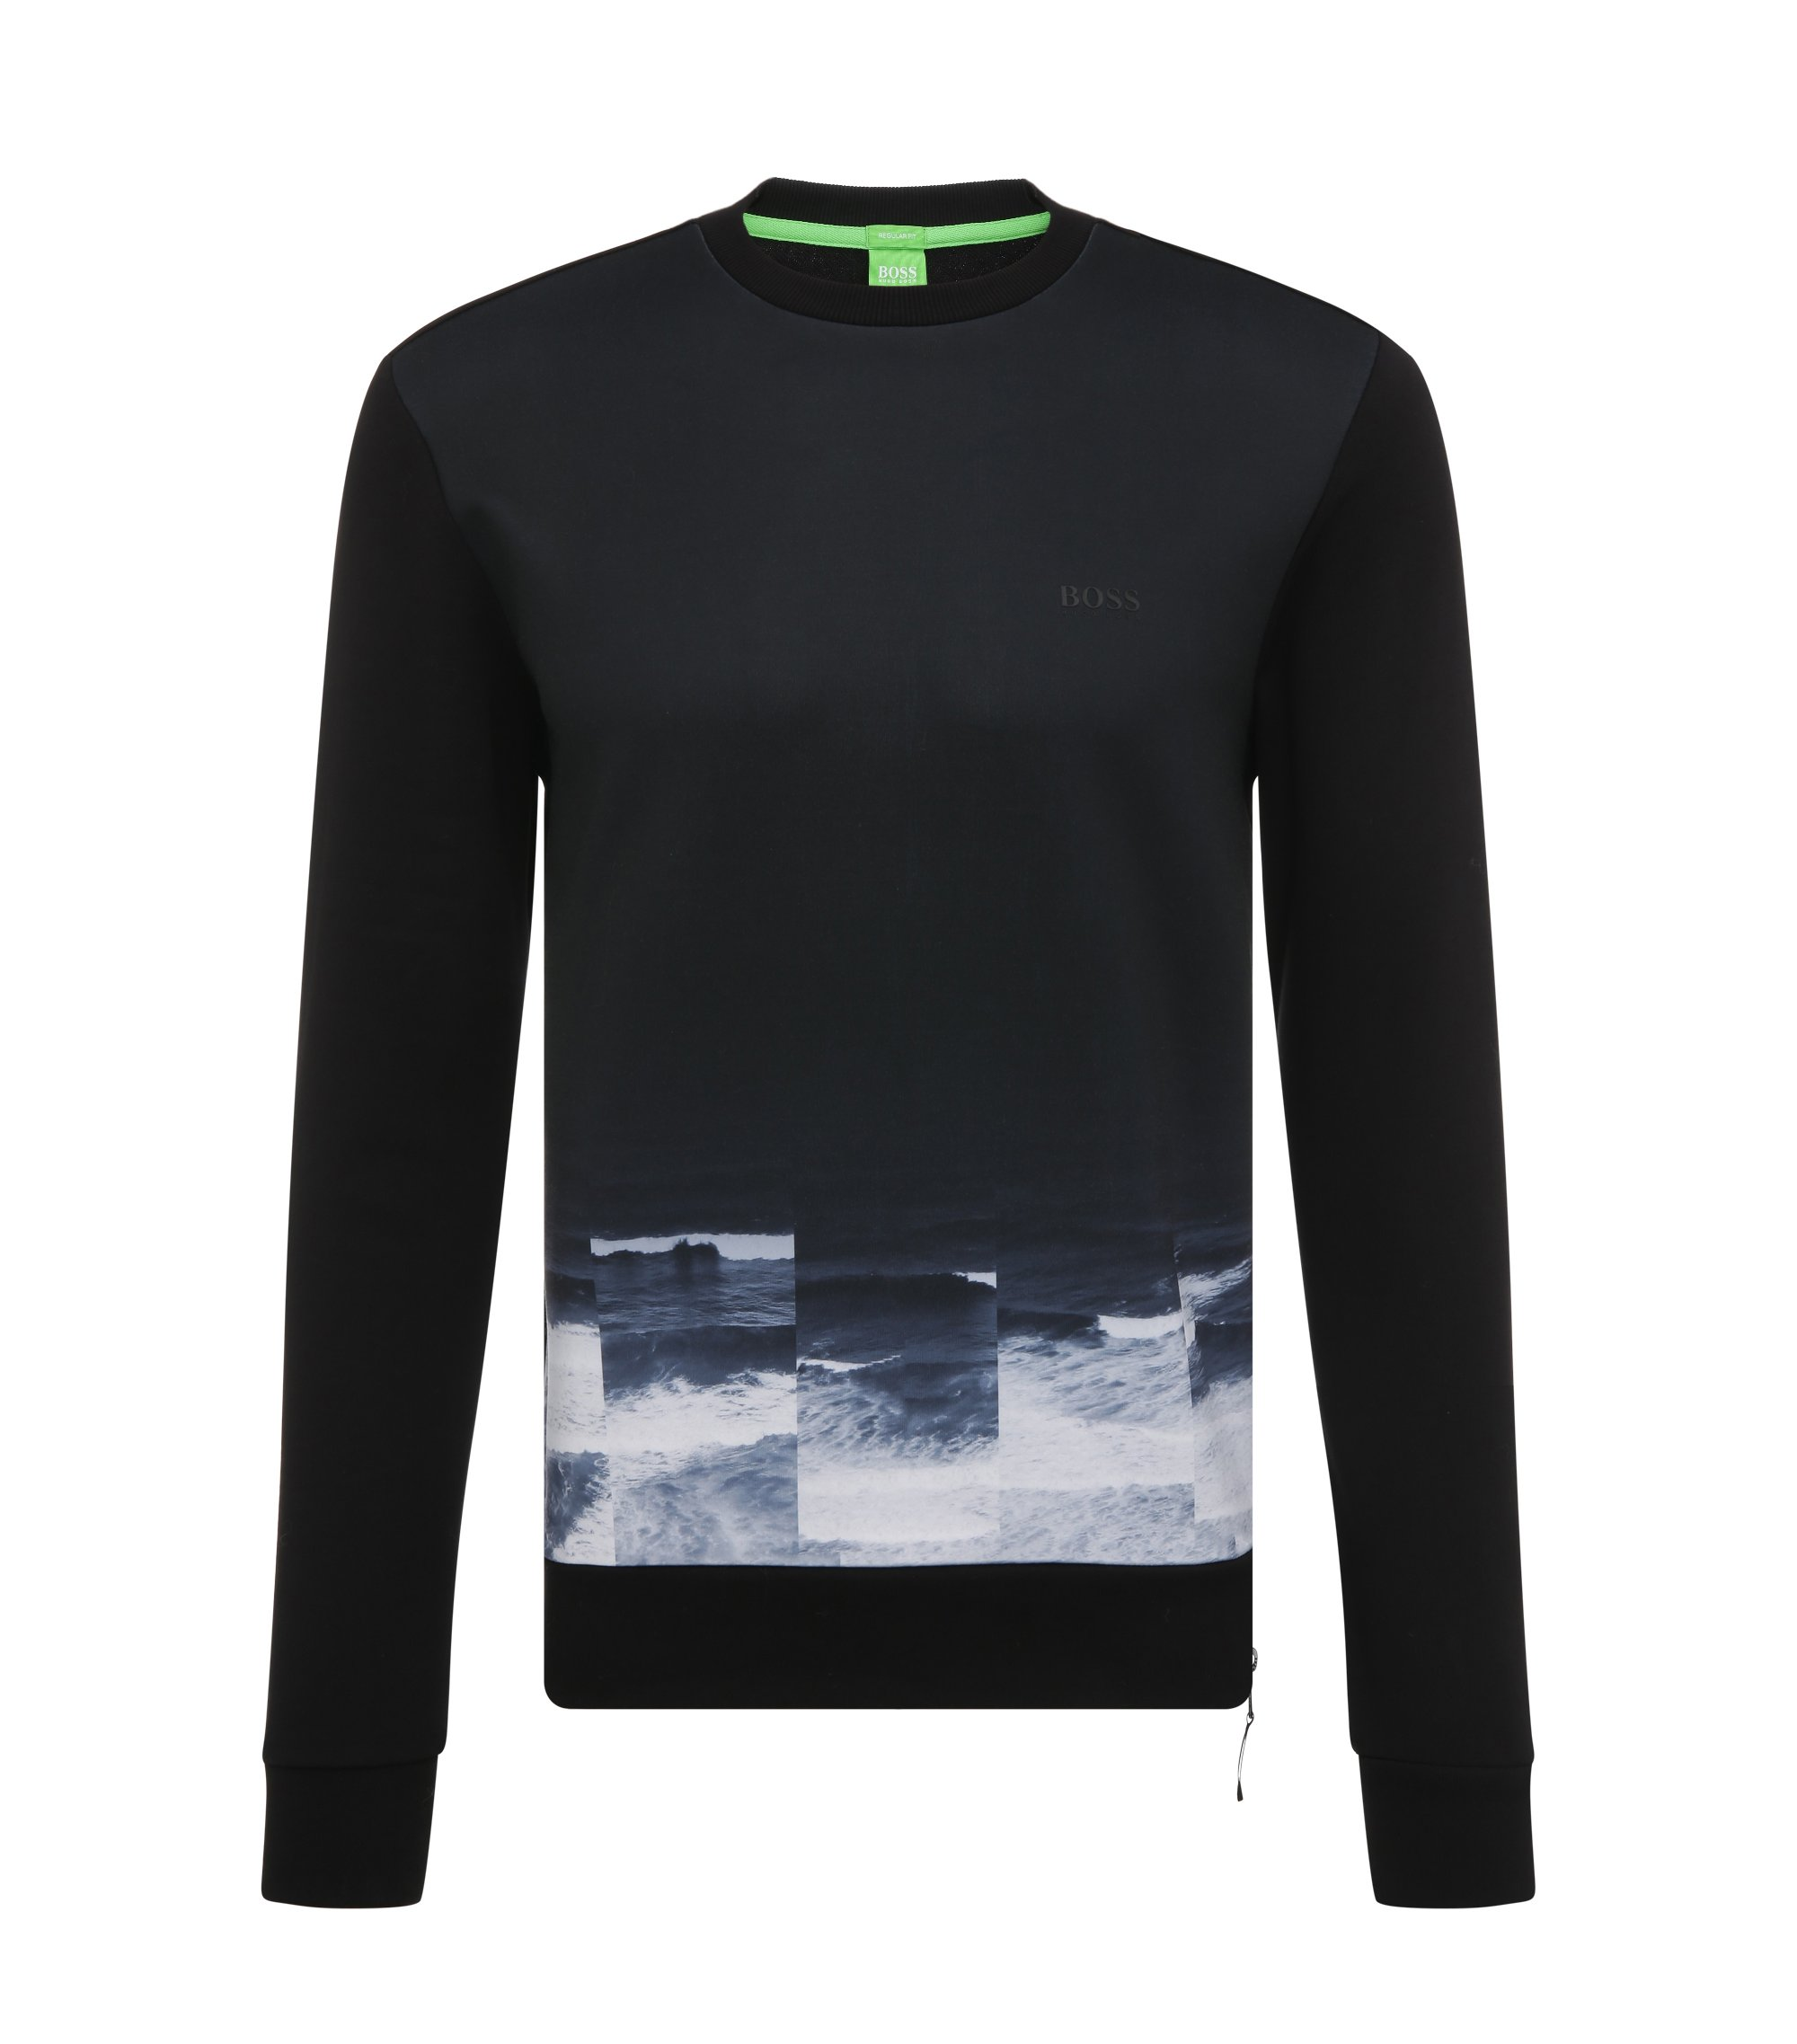 Cotton Printed Sweatshirt | Salbon, Black